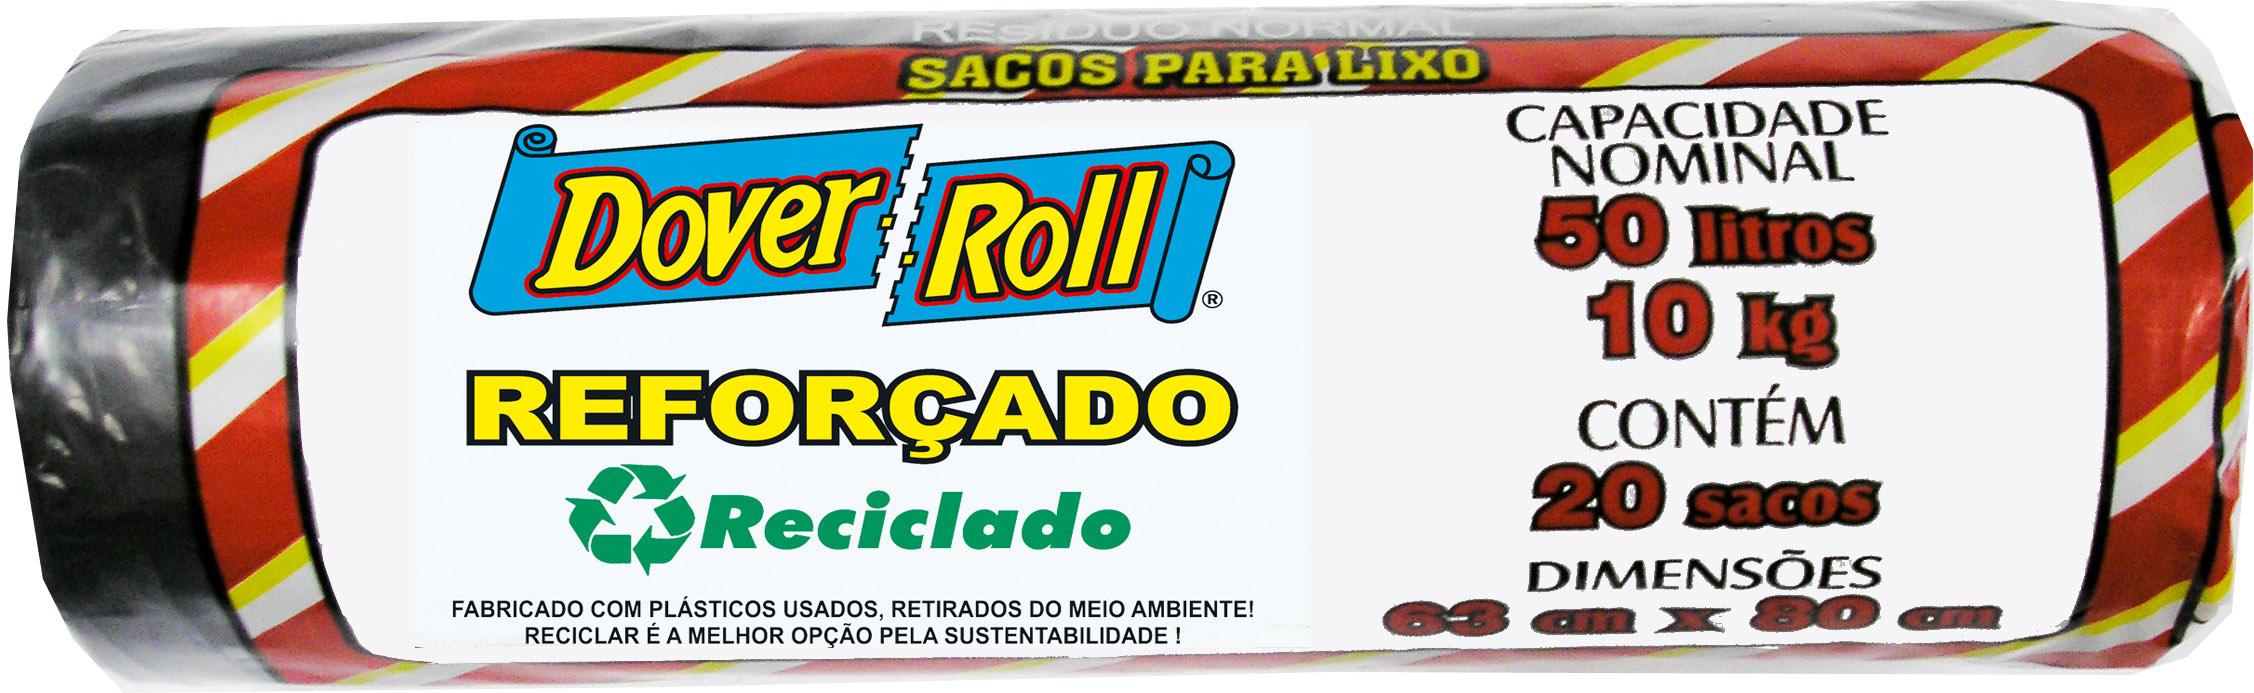 Saco para Lixo Dover-Roll Reforçado Reciclado 50L c/20